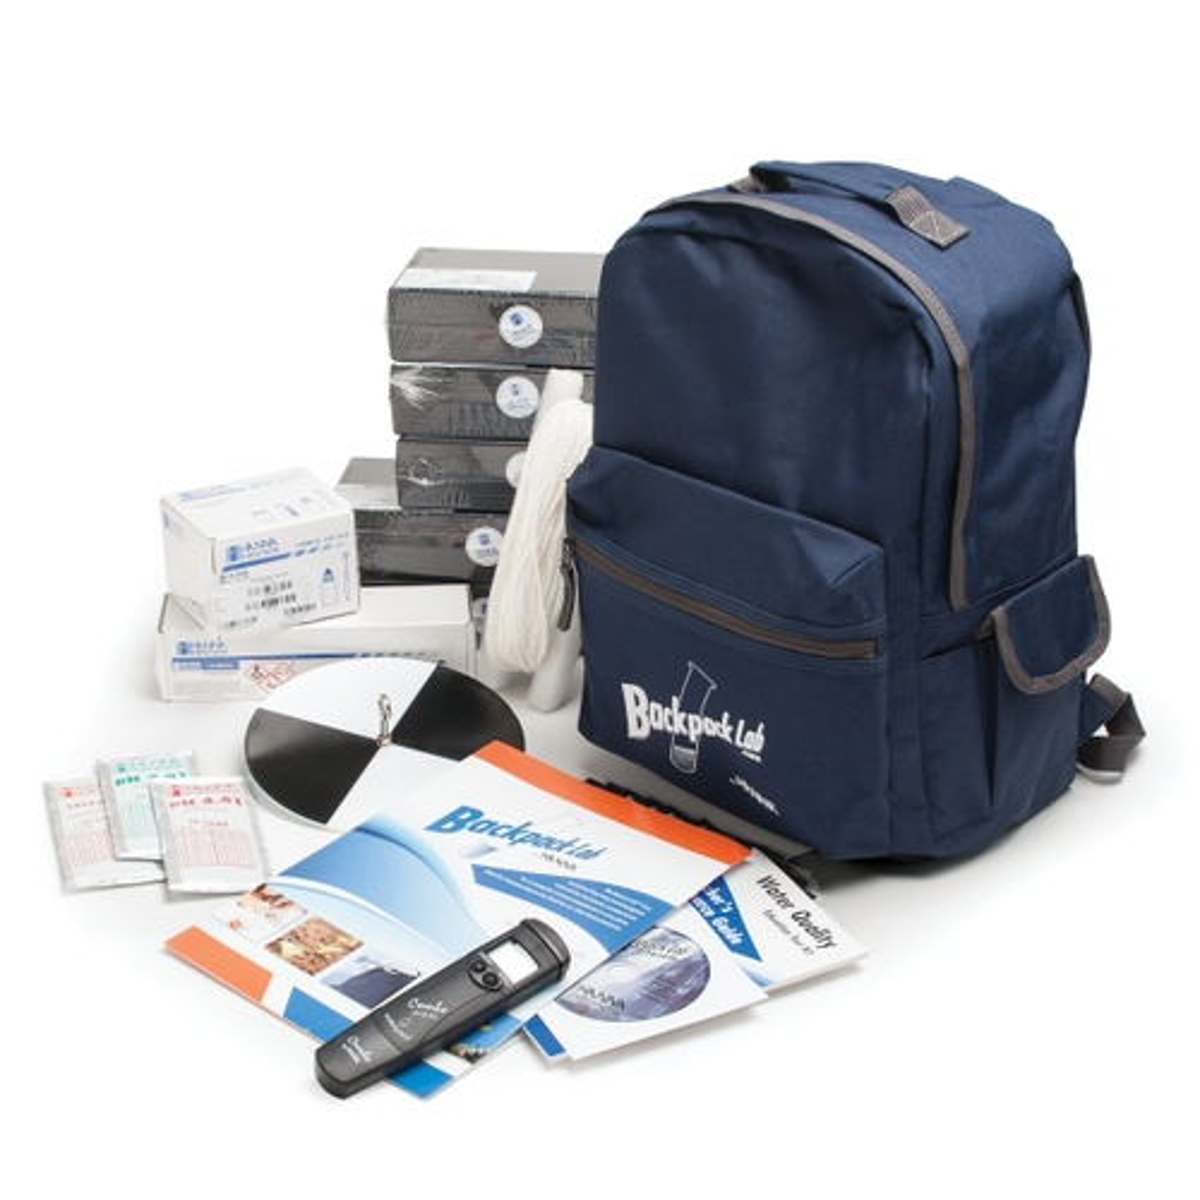 HI3817BP Backpack Lab Water Quality Educational Test Kit